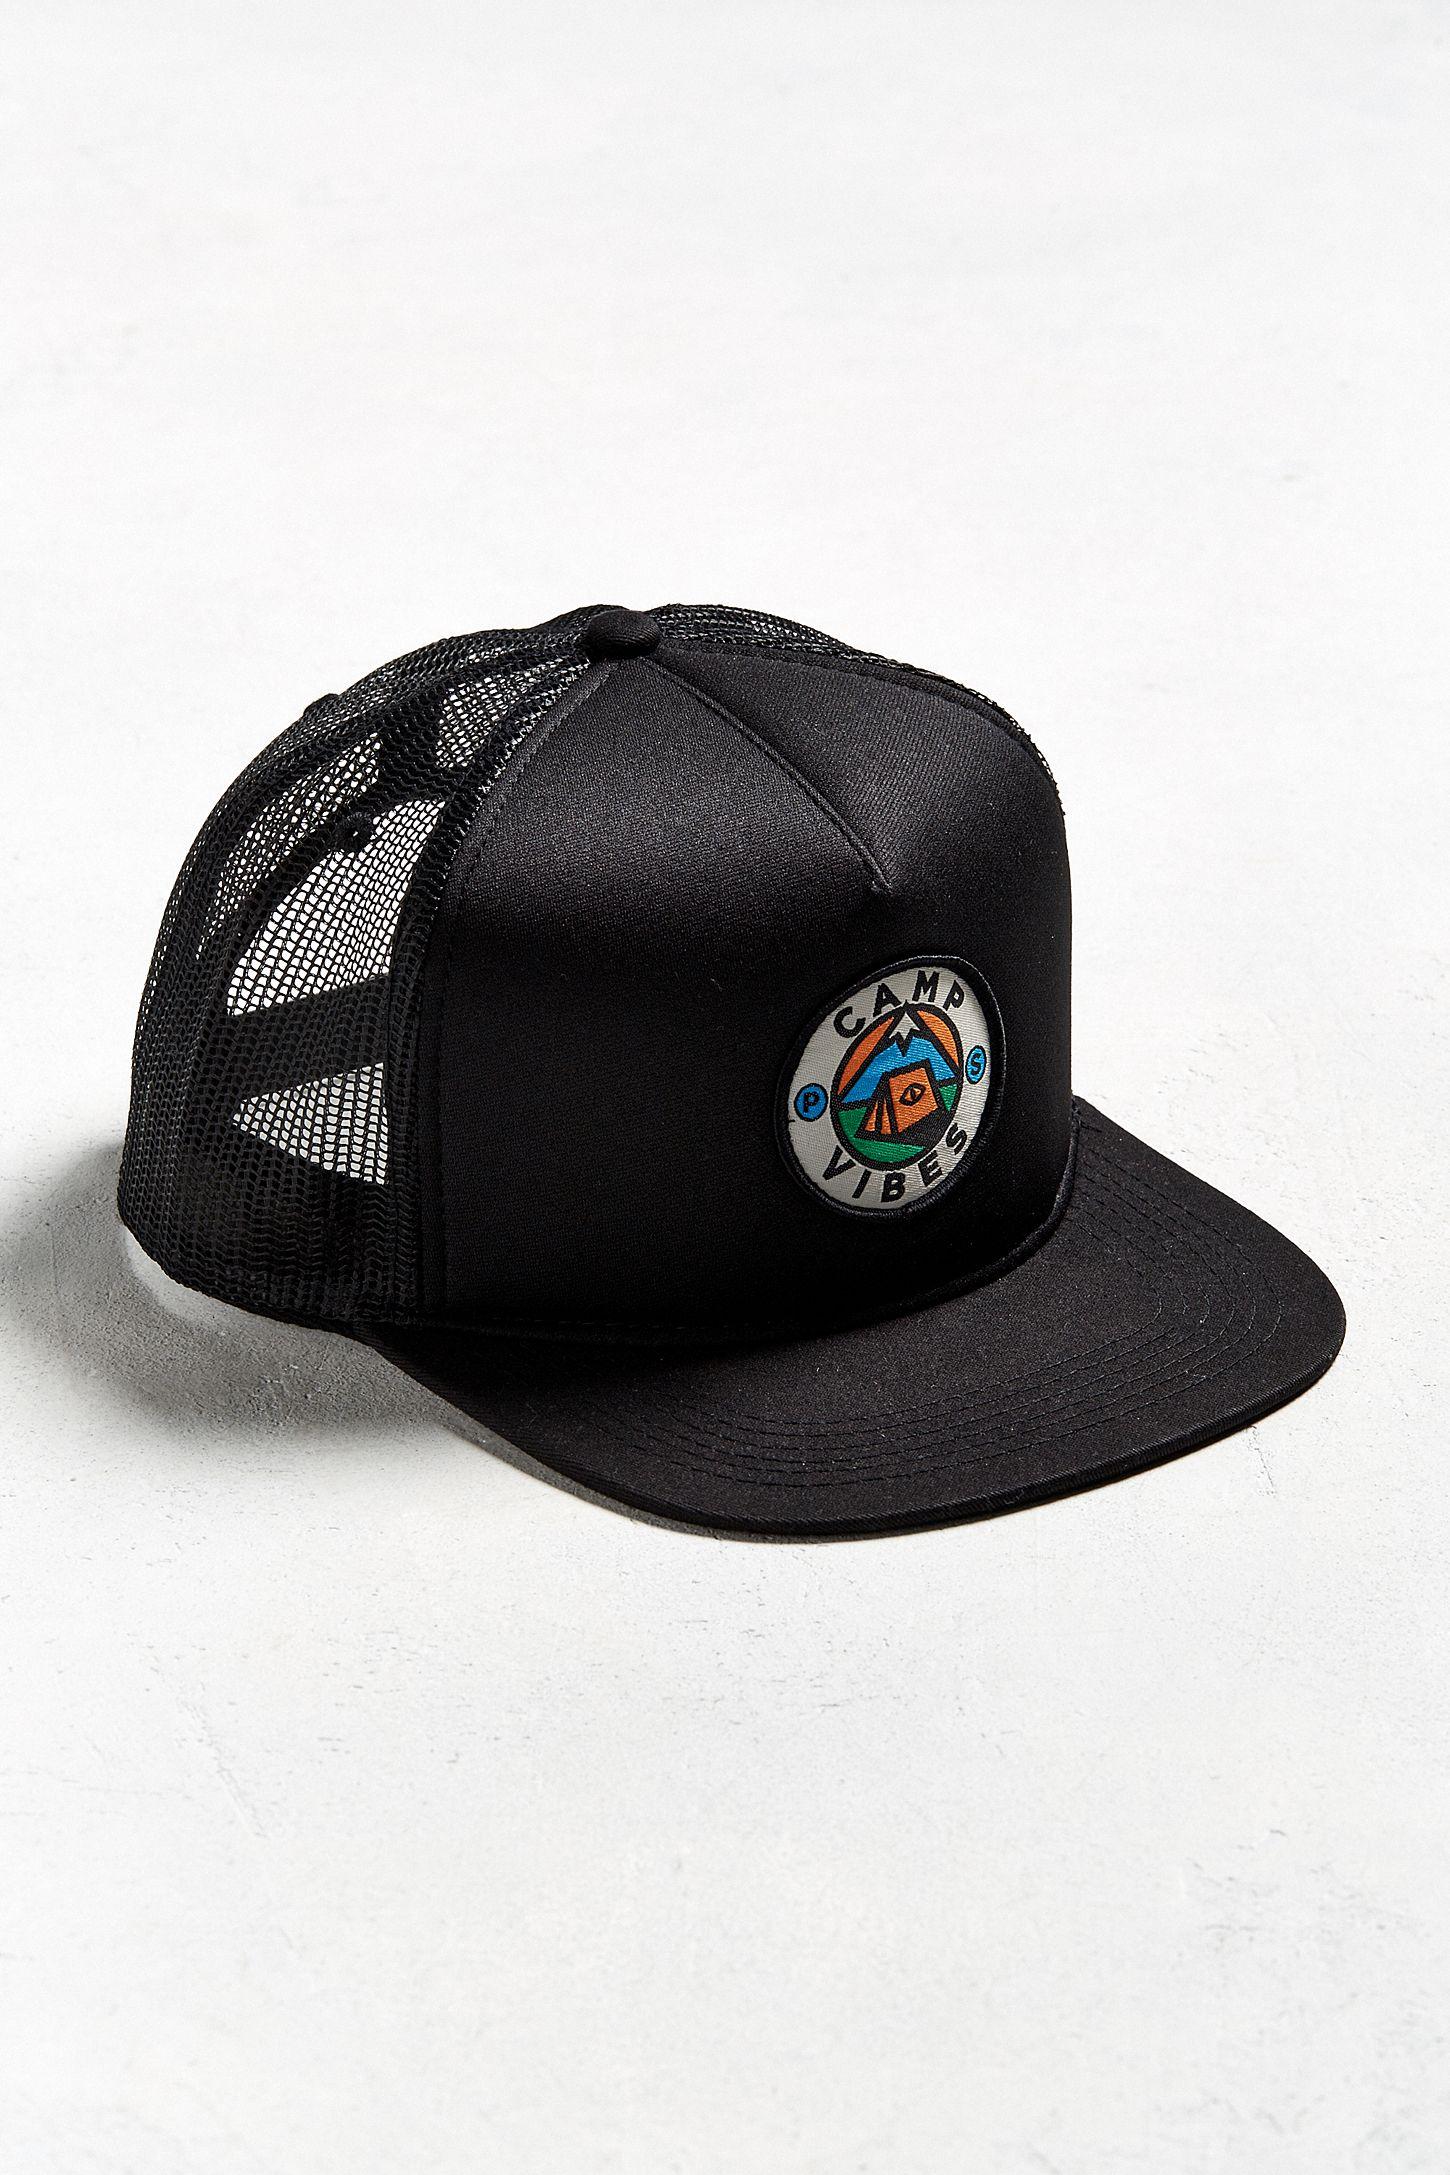 Poler Camp Vibes Trucker Hat  17e5d085564